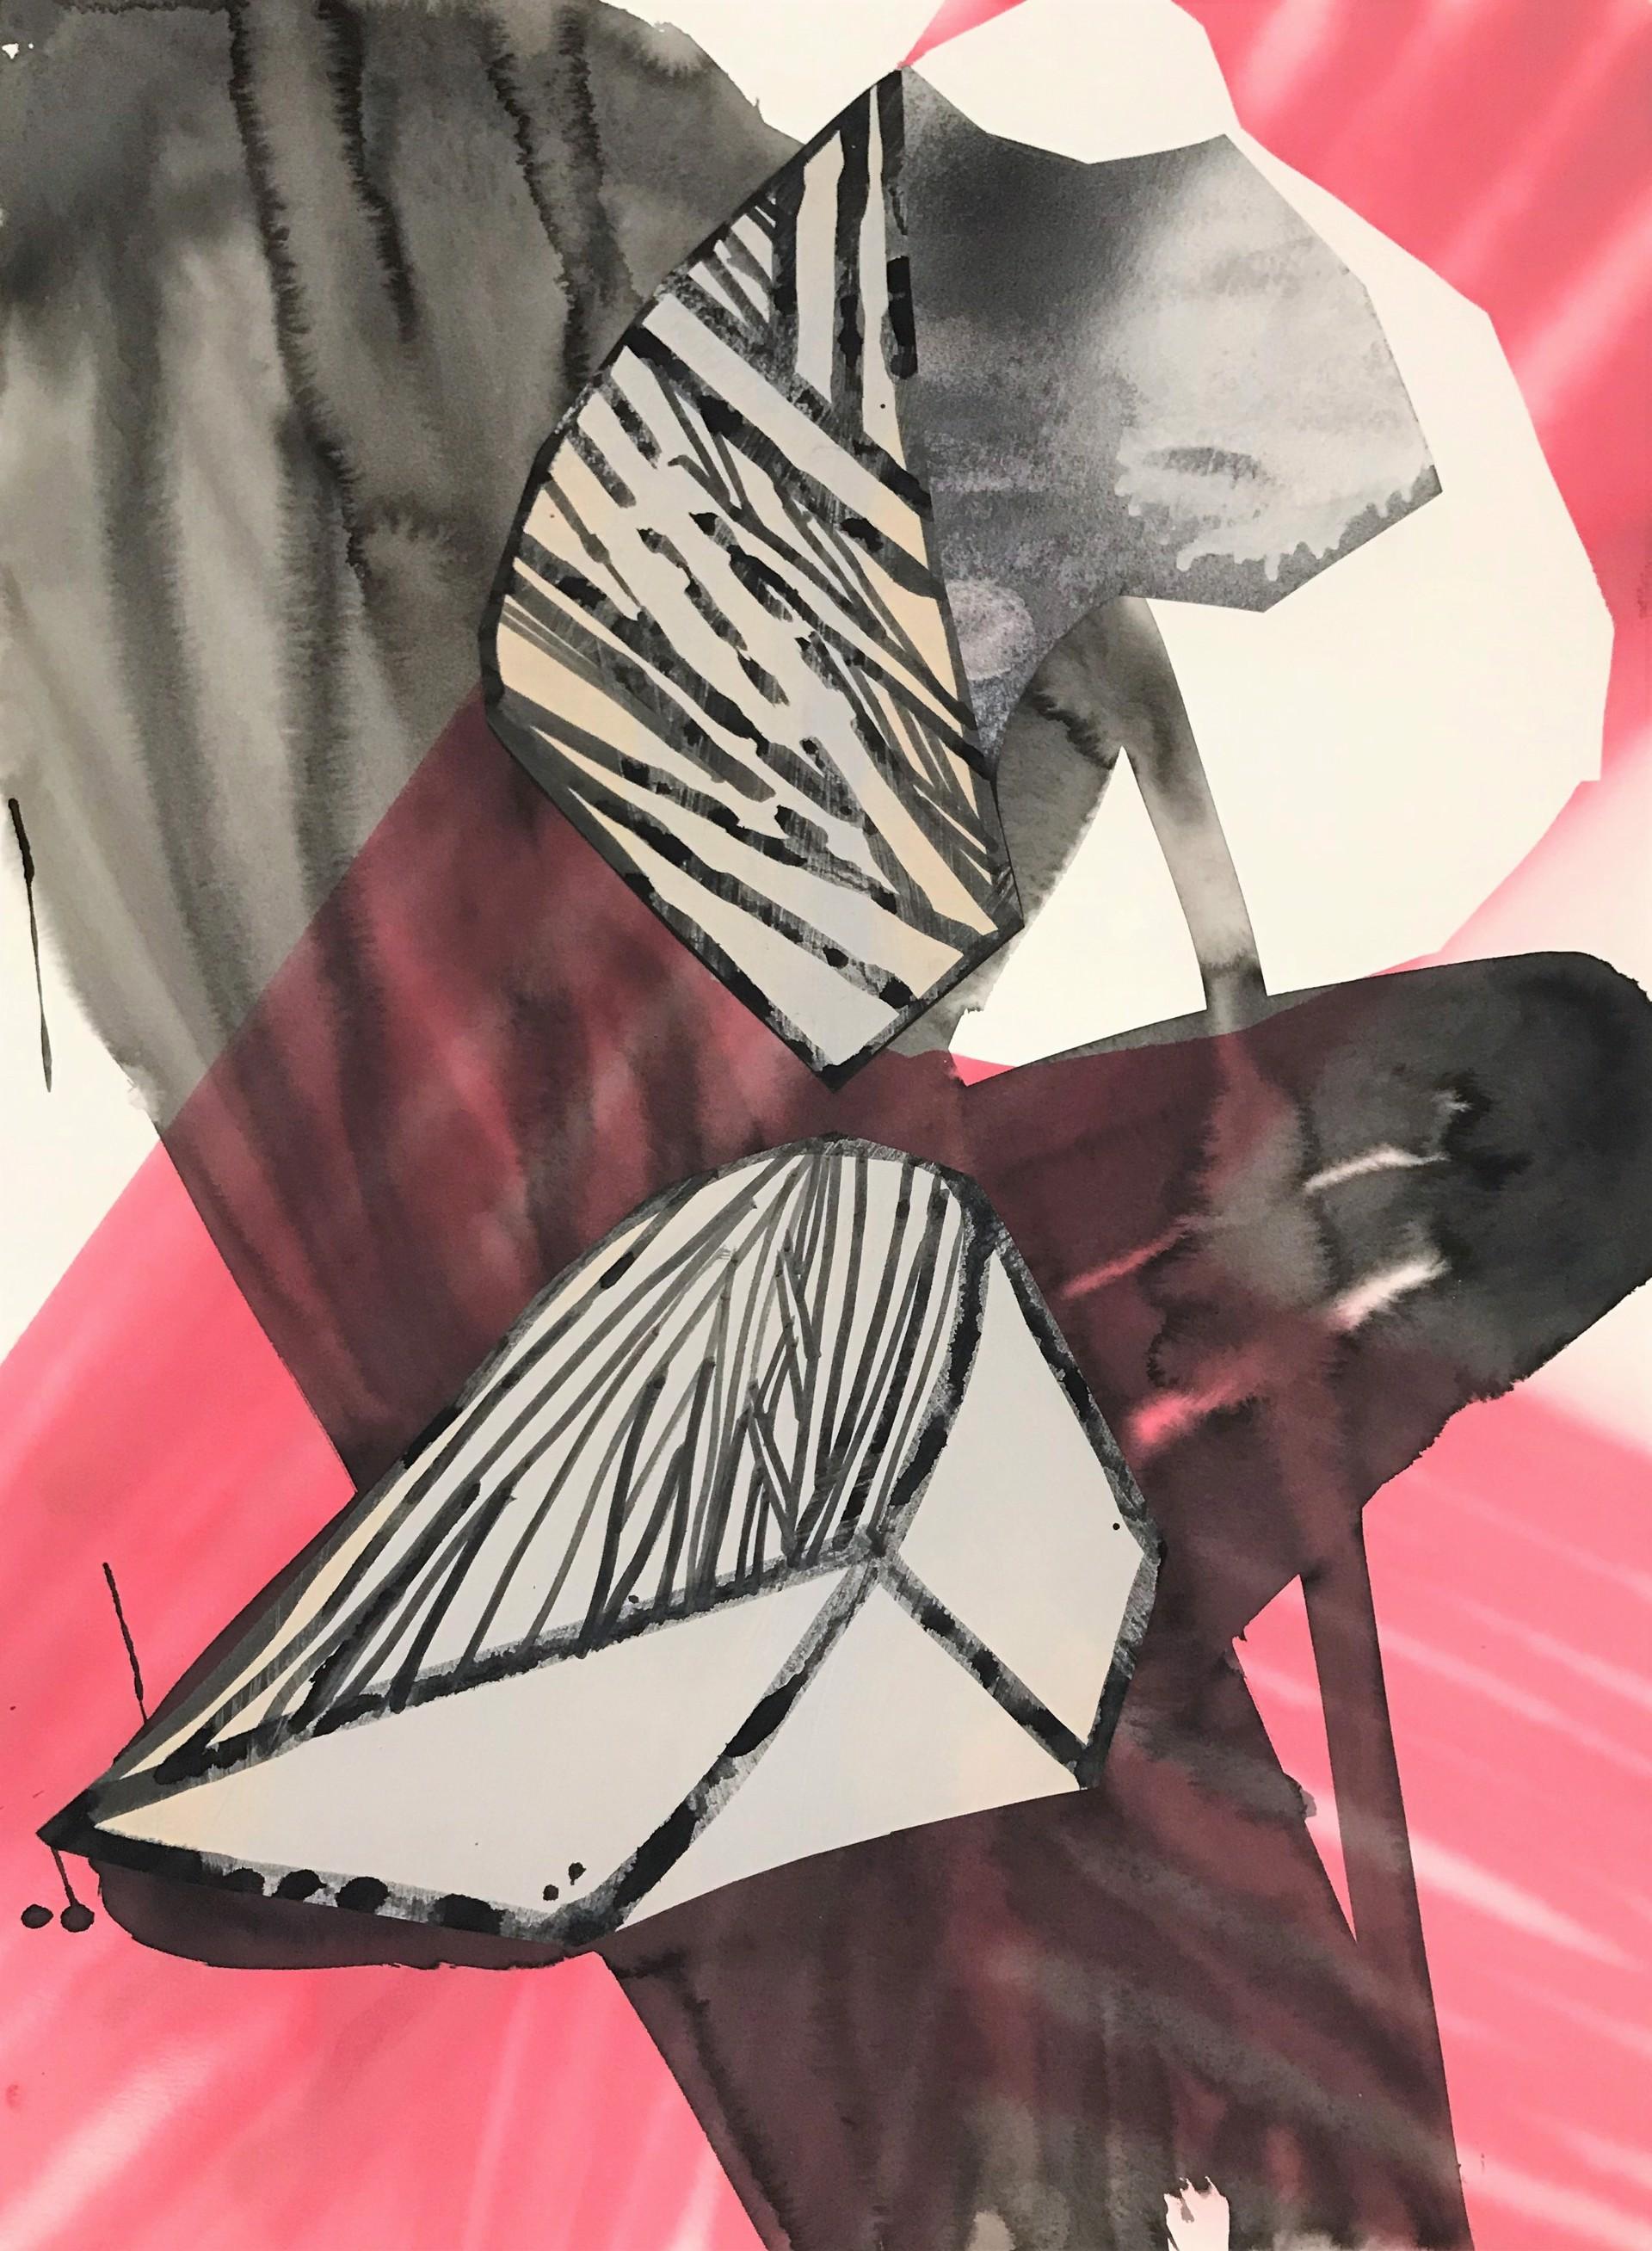 Untitled (After Gaugin) by Edgard Camacho